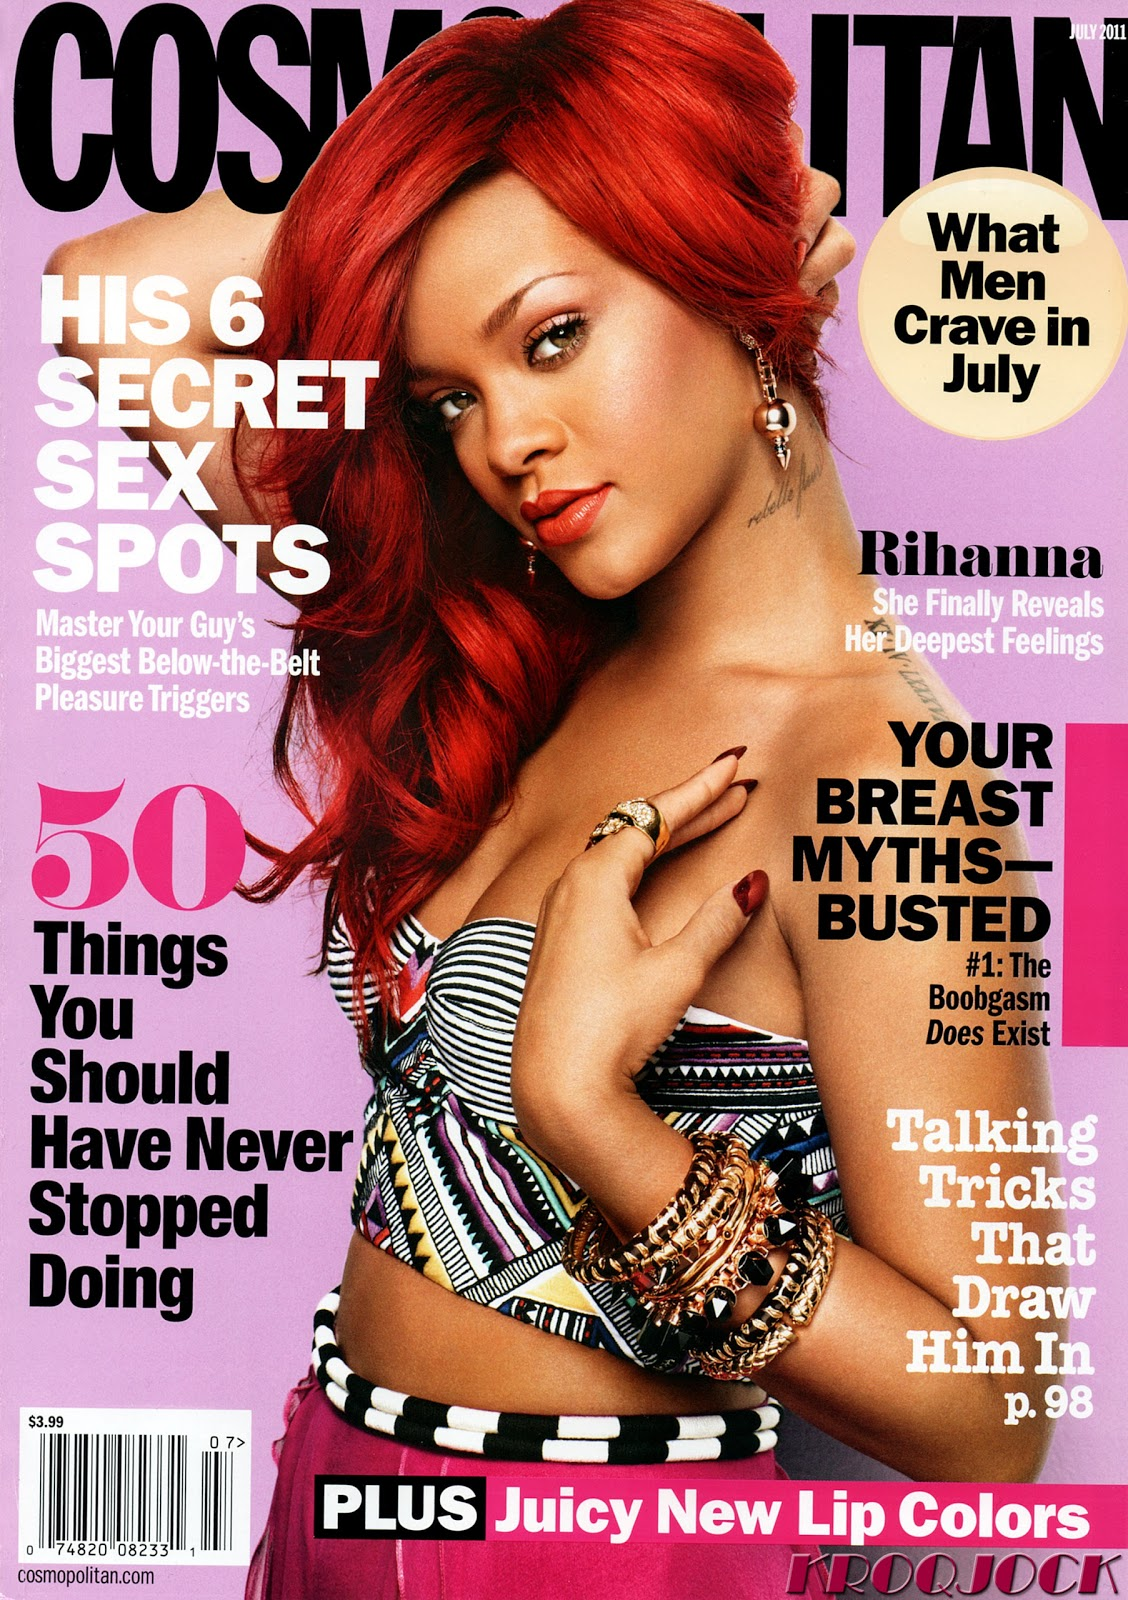 http://2.bp.blogspot.com/-vXKNiqtlJ7o/TeJvyCOUXxI/AAAAAAAABFU/eAoLGoTo6Qs/s1600/Rihanna.COSMOPOLITAN.jpg